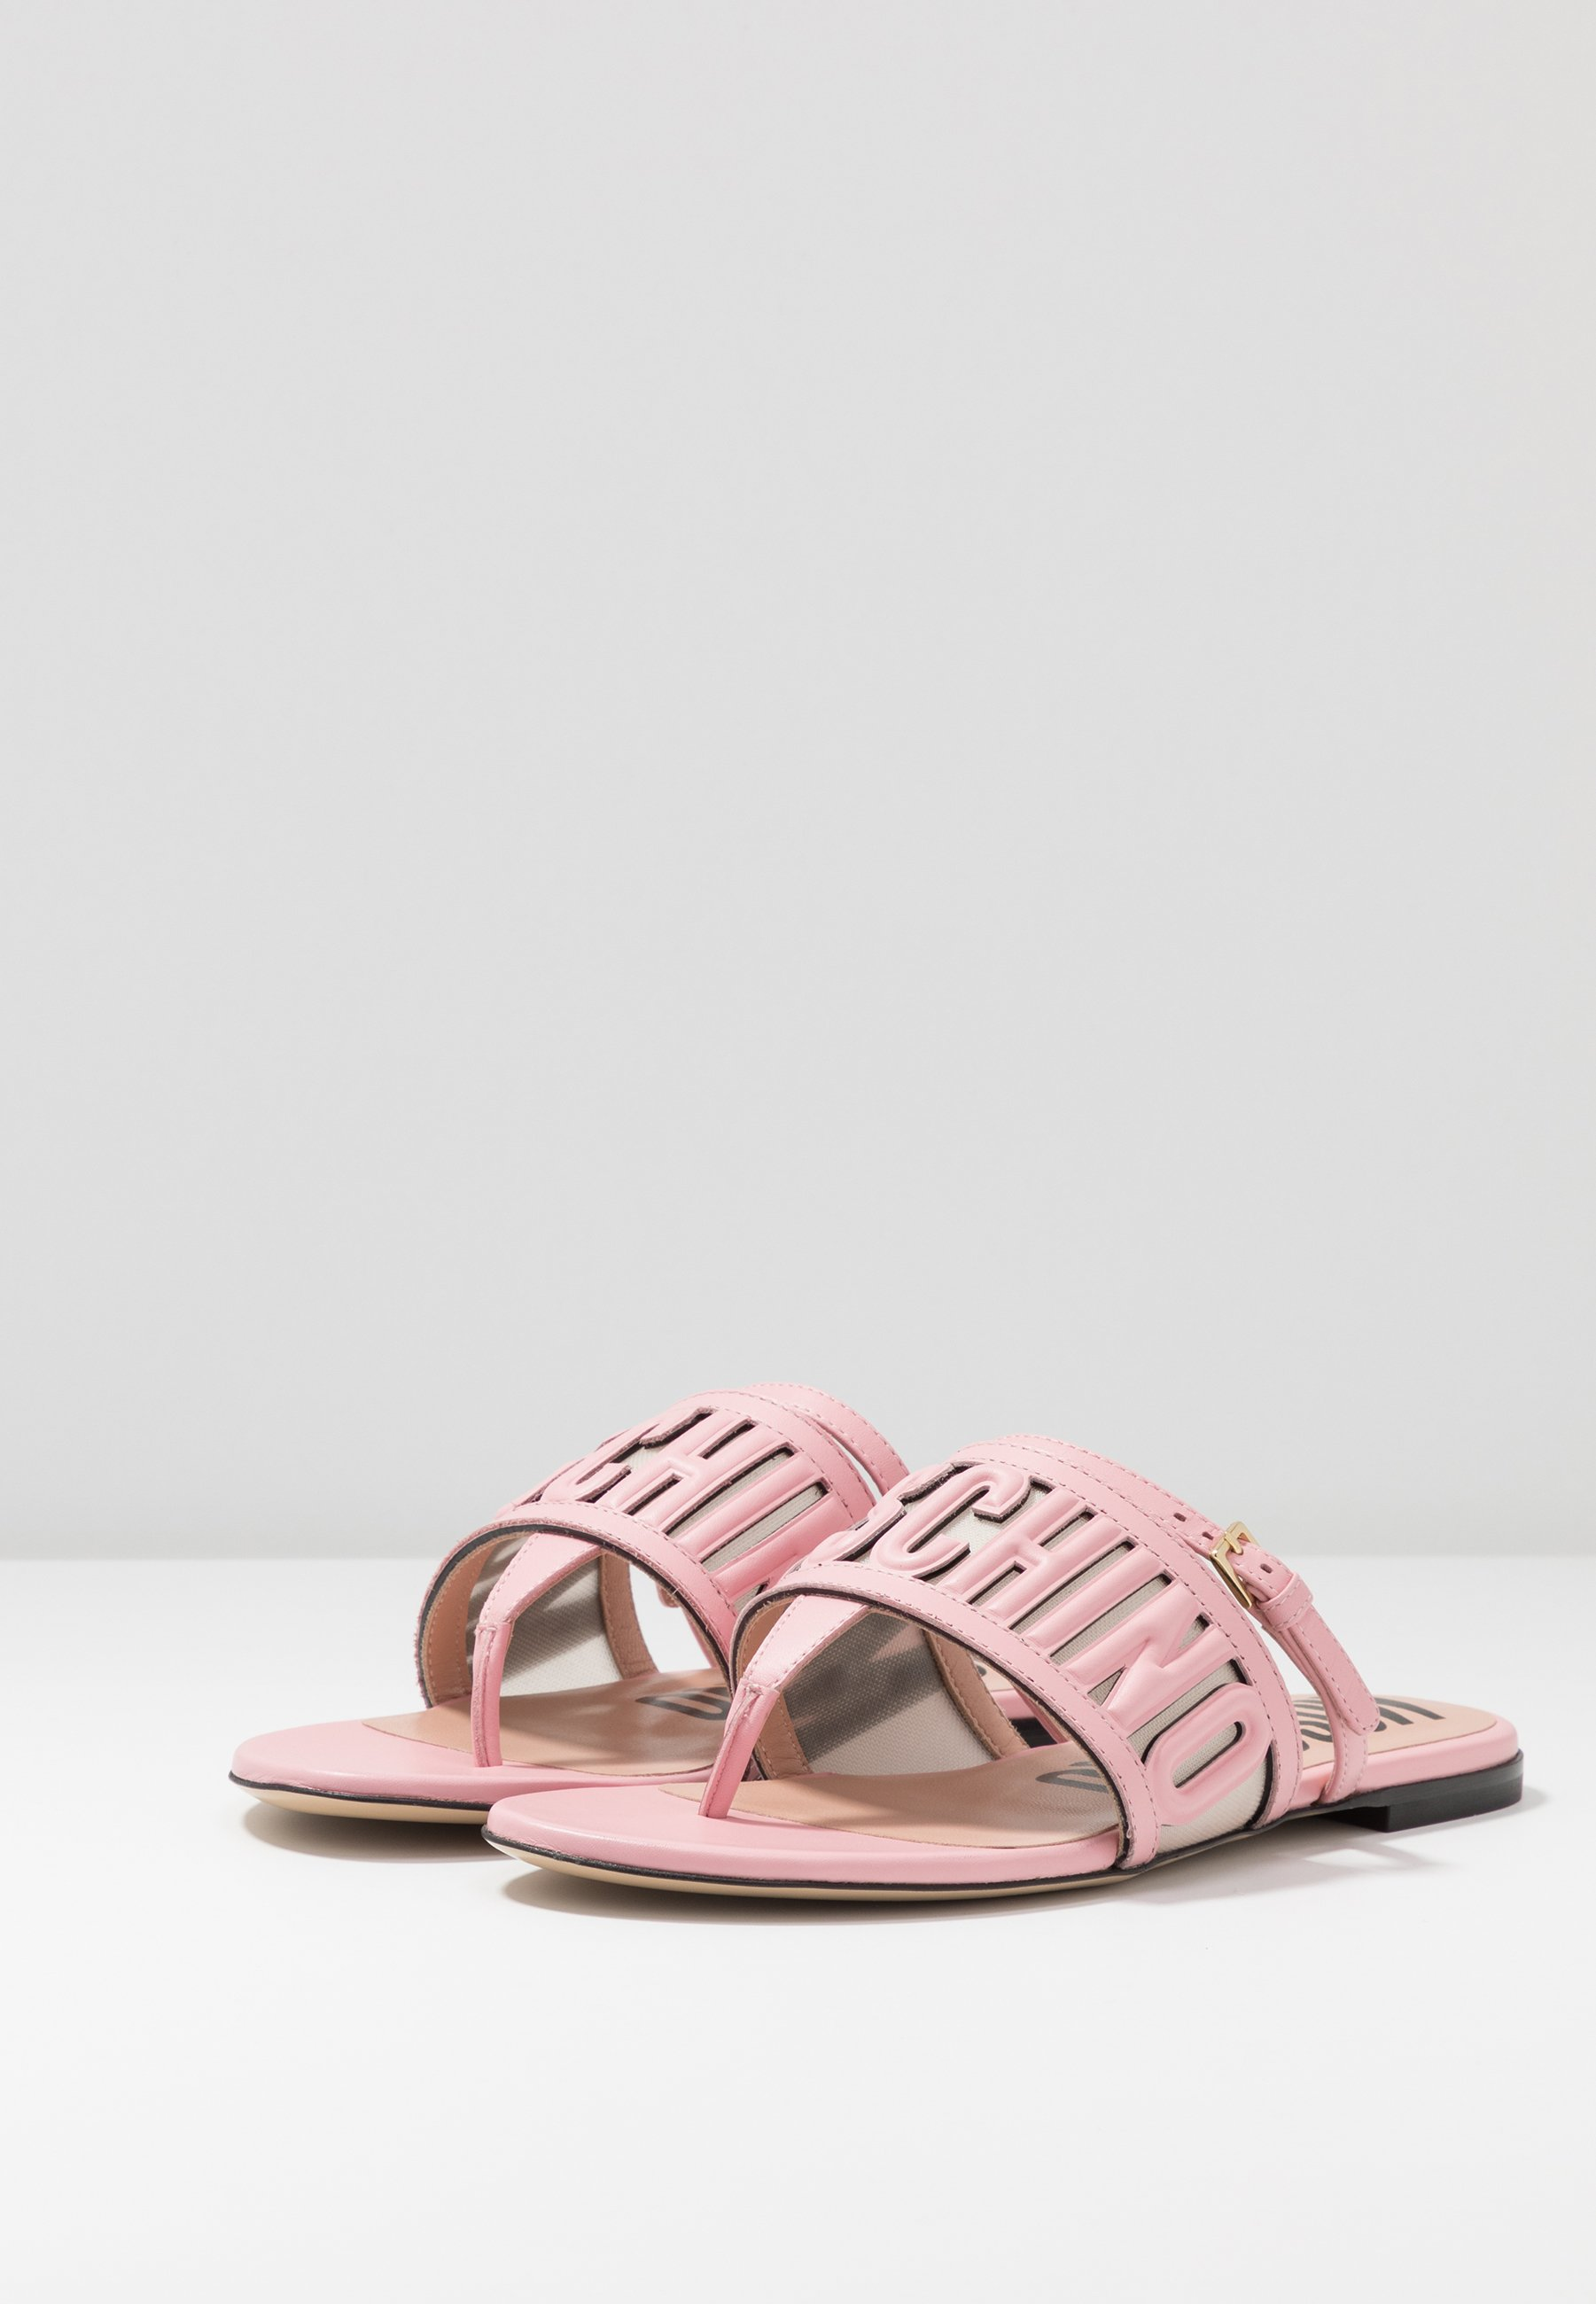 MOSCHINO Tongs - rosa - Sandales & Nu-pieds femme Limité